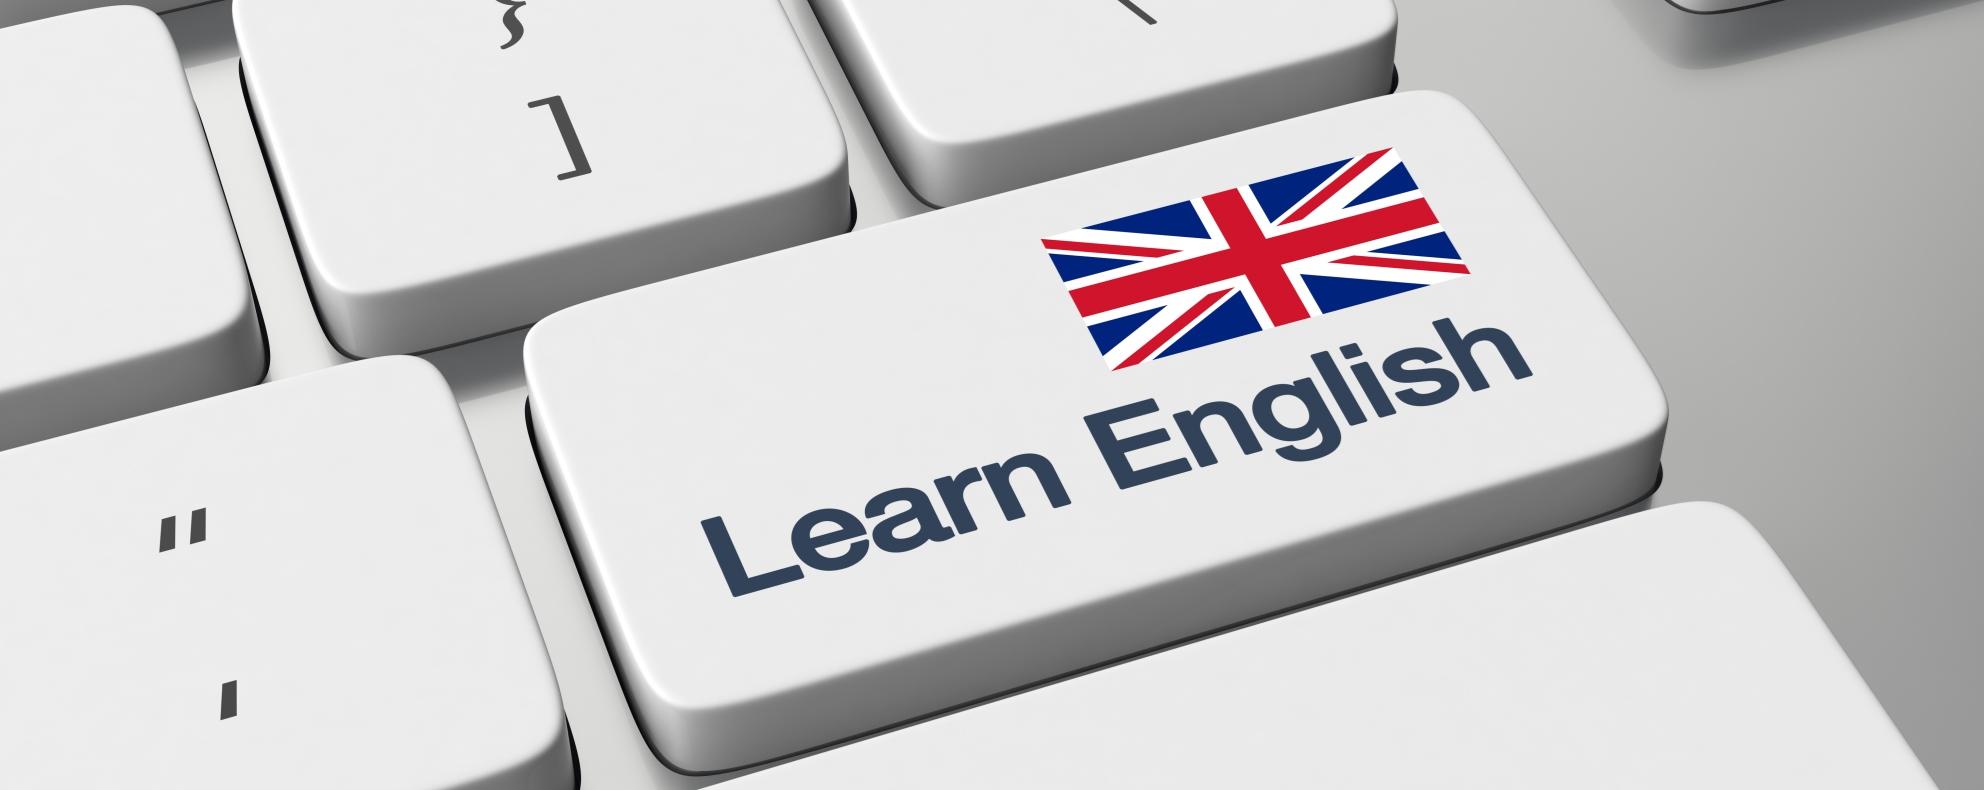 Nem kell többet nyelvet tanulni?